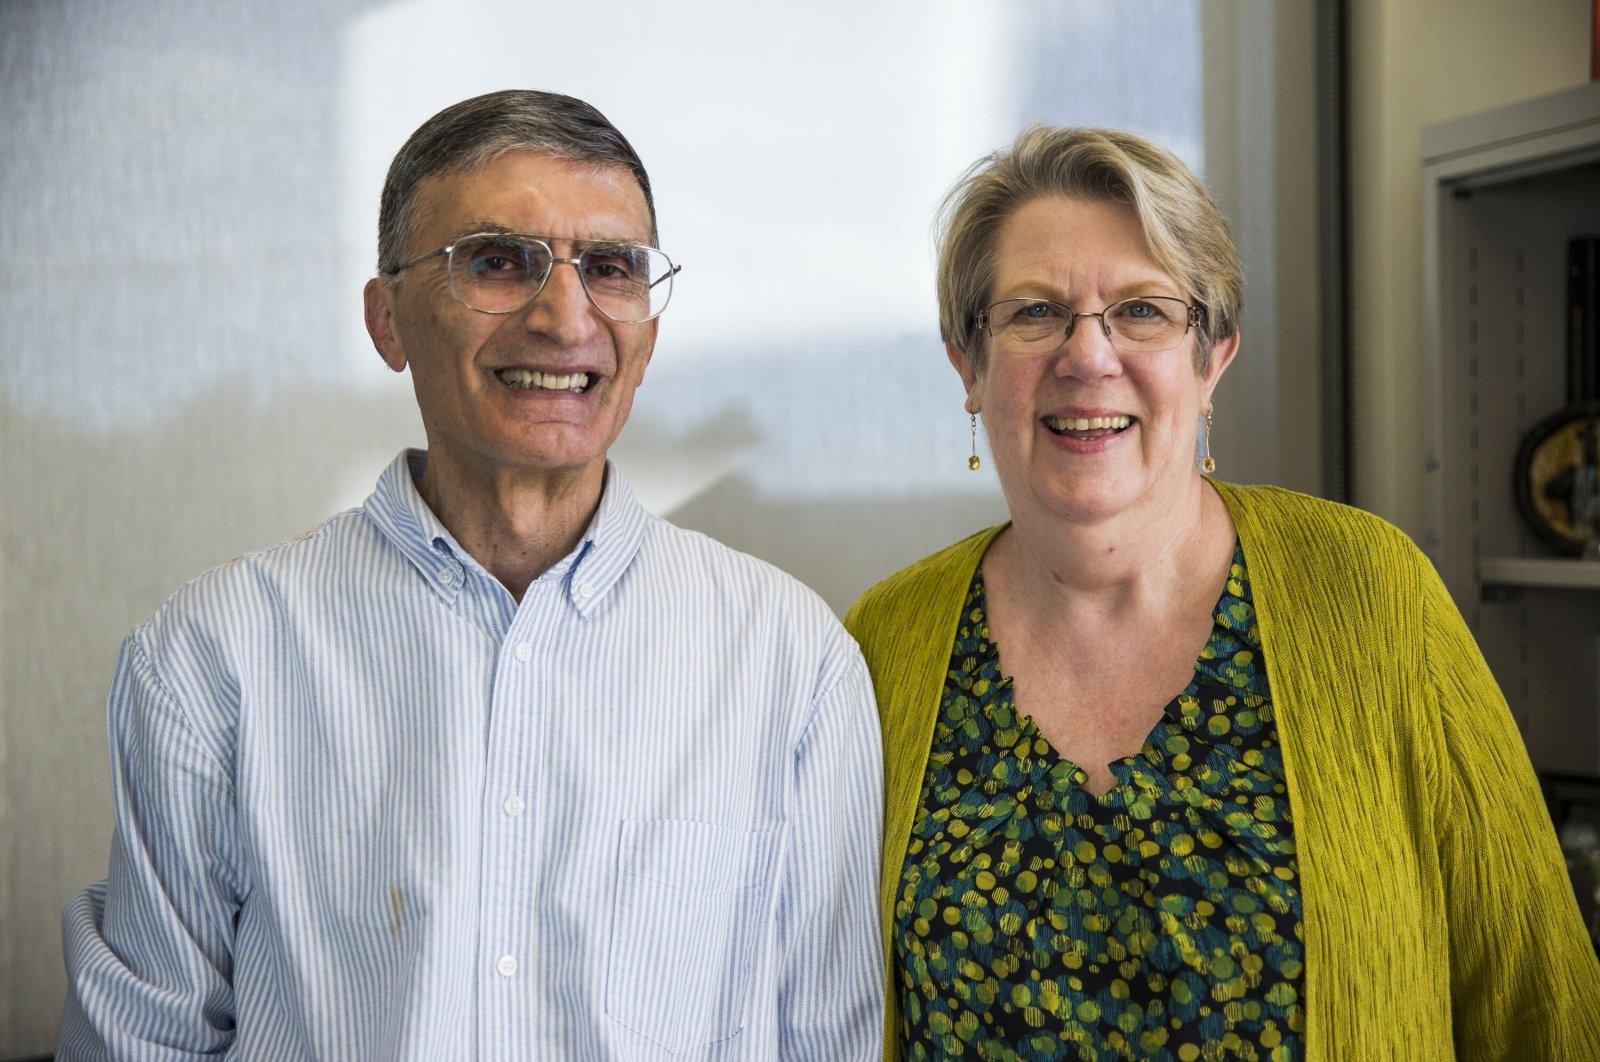 Nobel Prize laureate Aziz Sancar (L) and his wife, Gwen, speak with an Anadolu Agency (AA) correspondent at the University of North Carolina School of Medicine, Chapel Hill, North Carolina, U.S. (AA Photo)